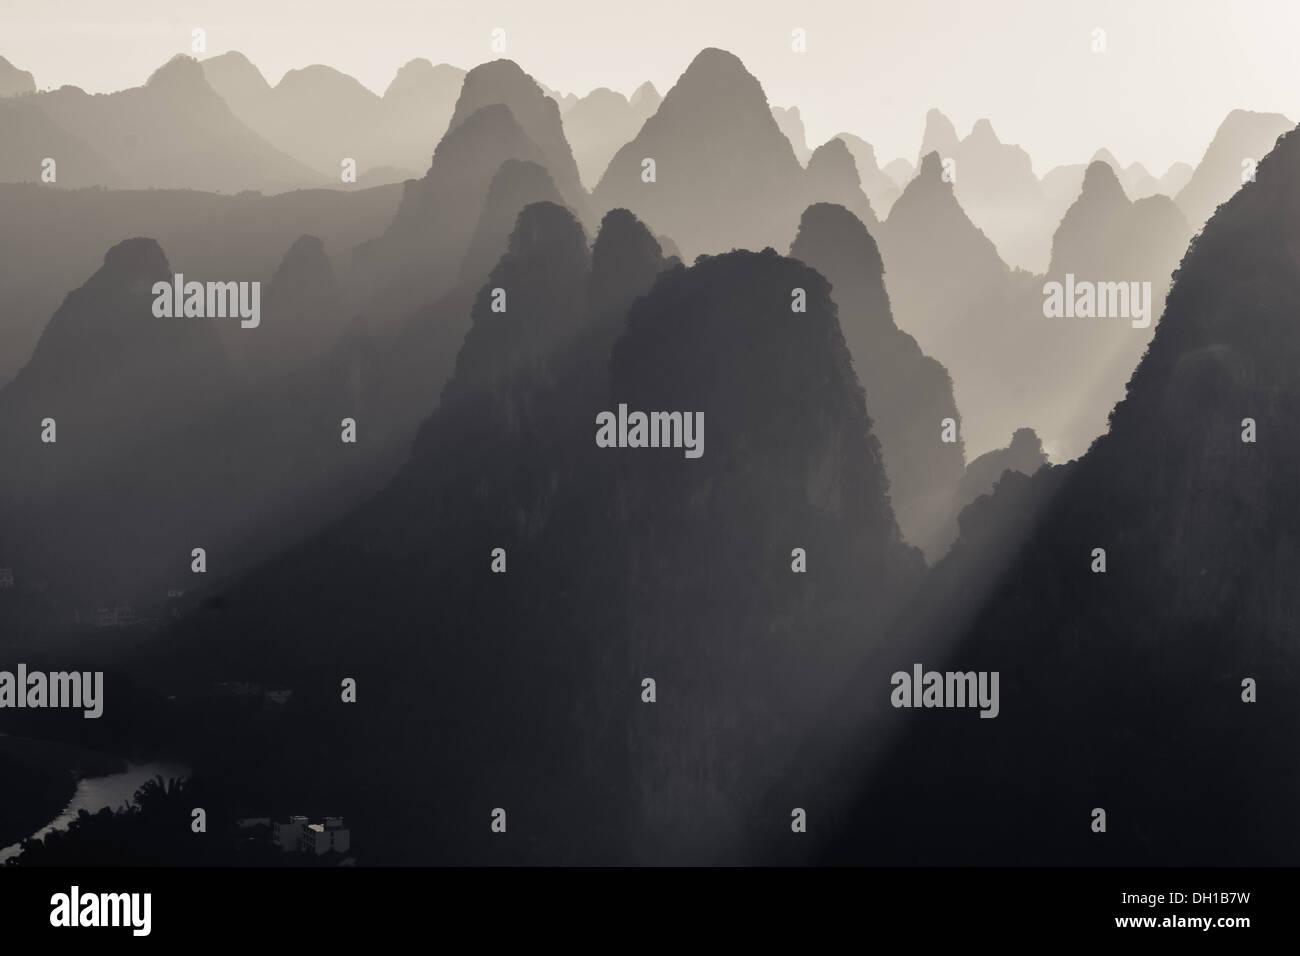 Sun rays coming through Karst peaks in China Stock Photo